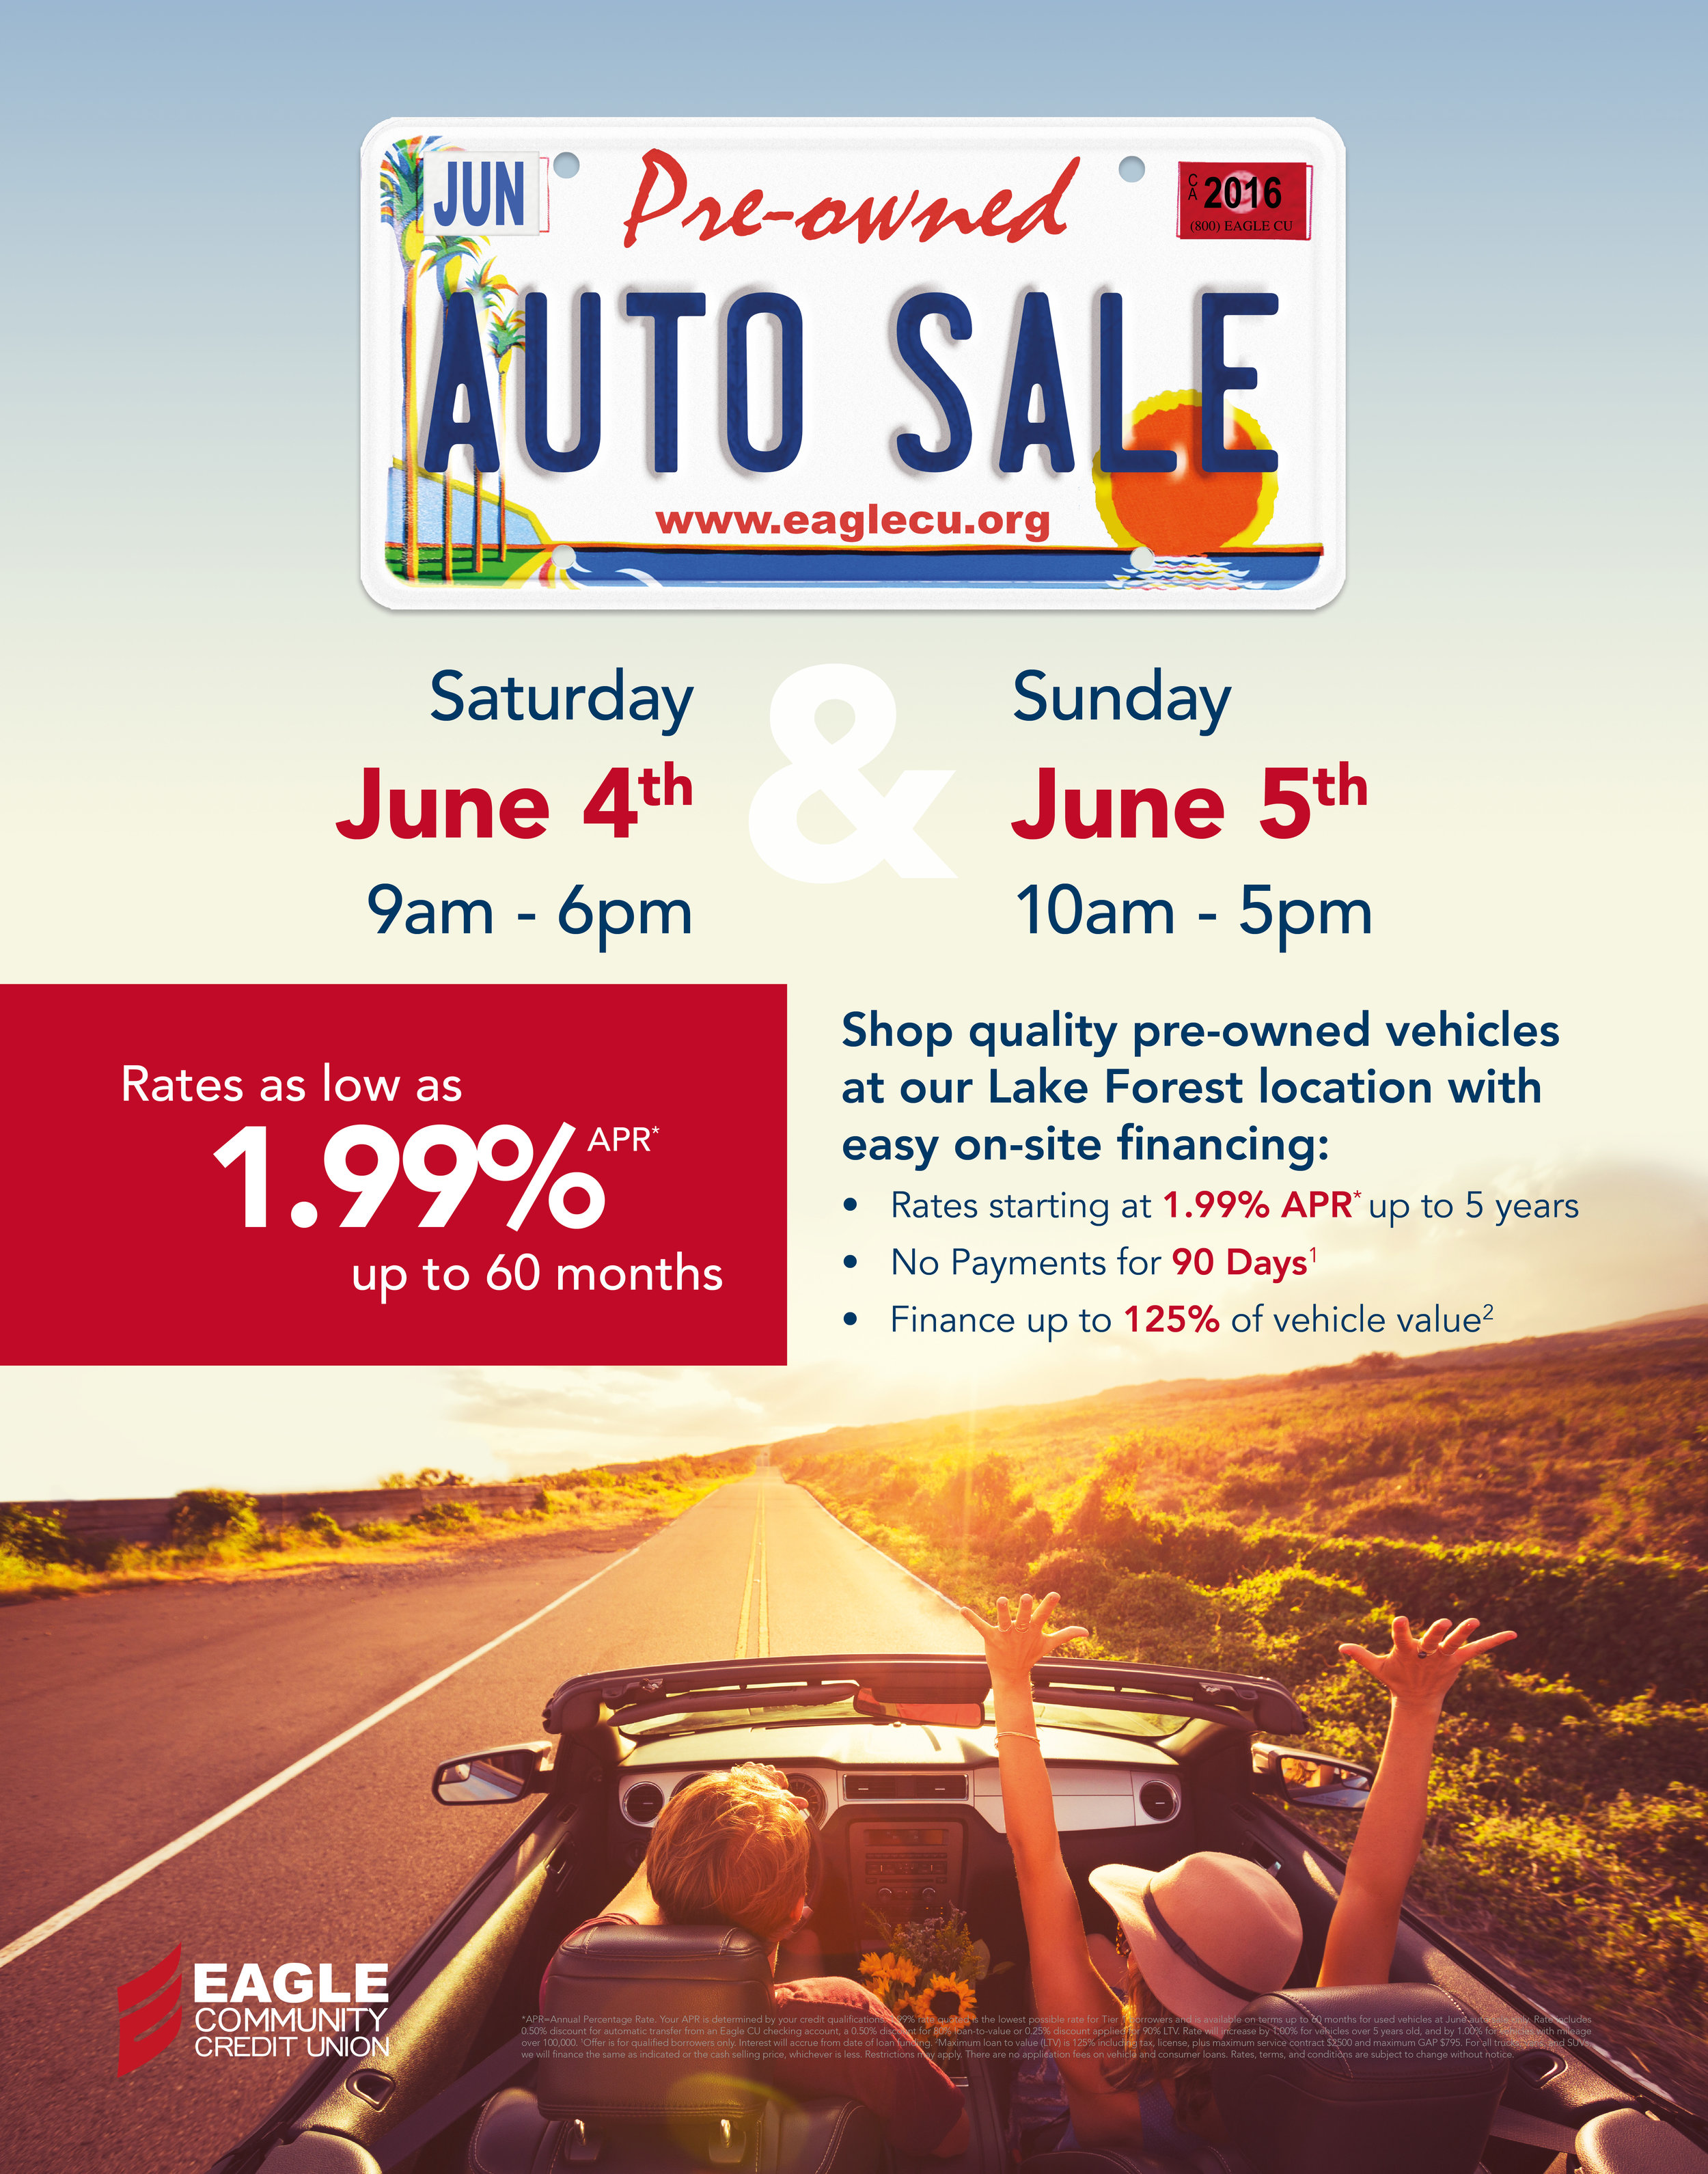 2016 Auto Sale Poster 22x28.jpg